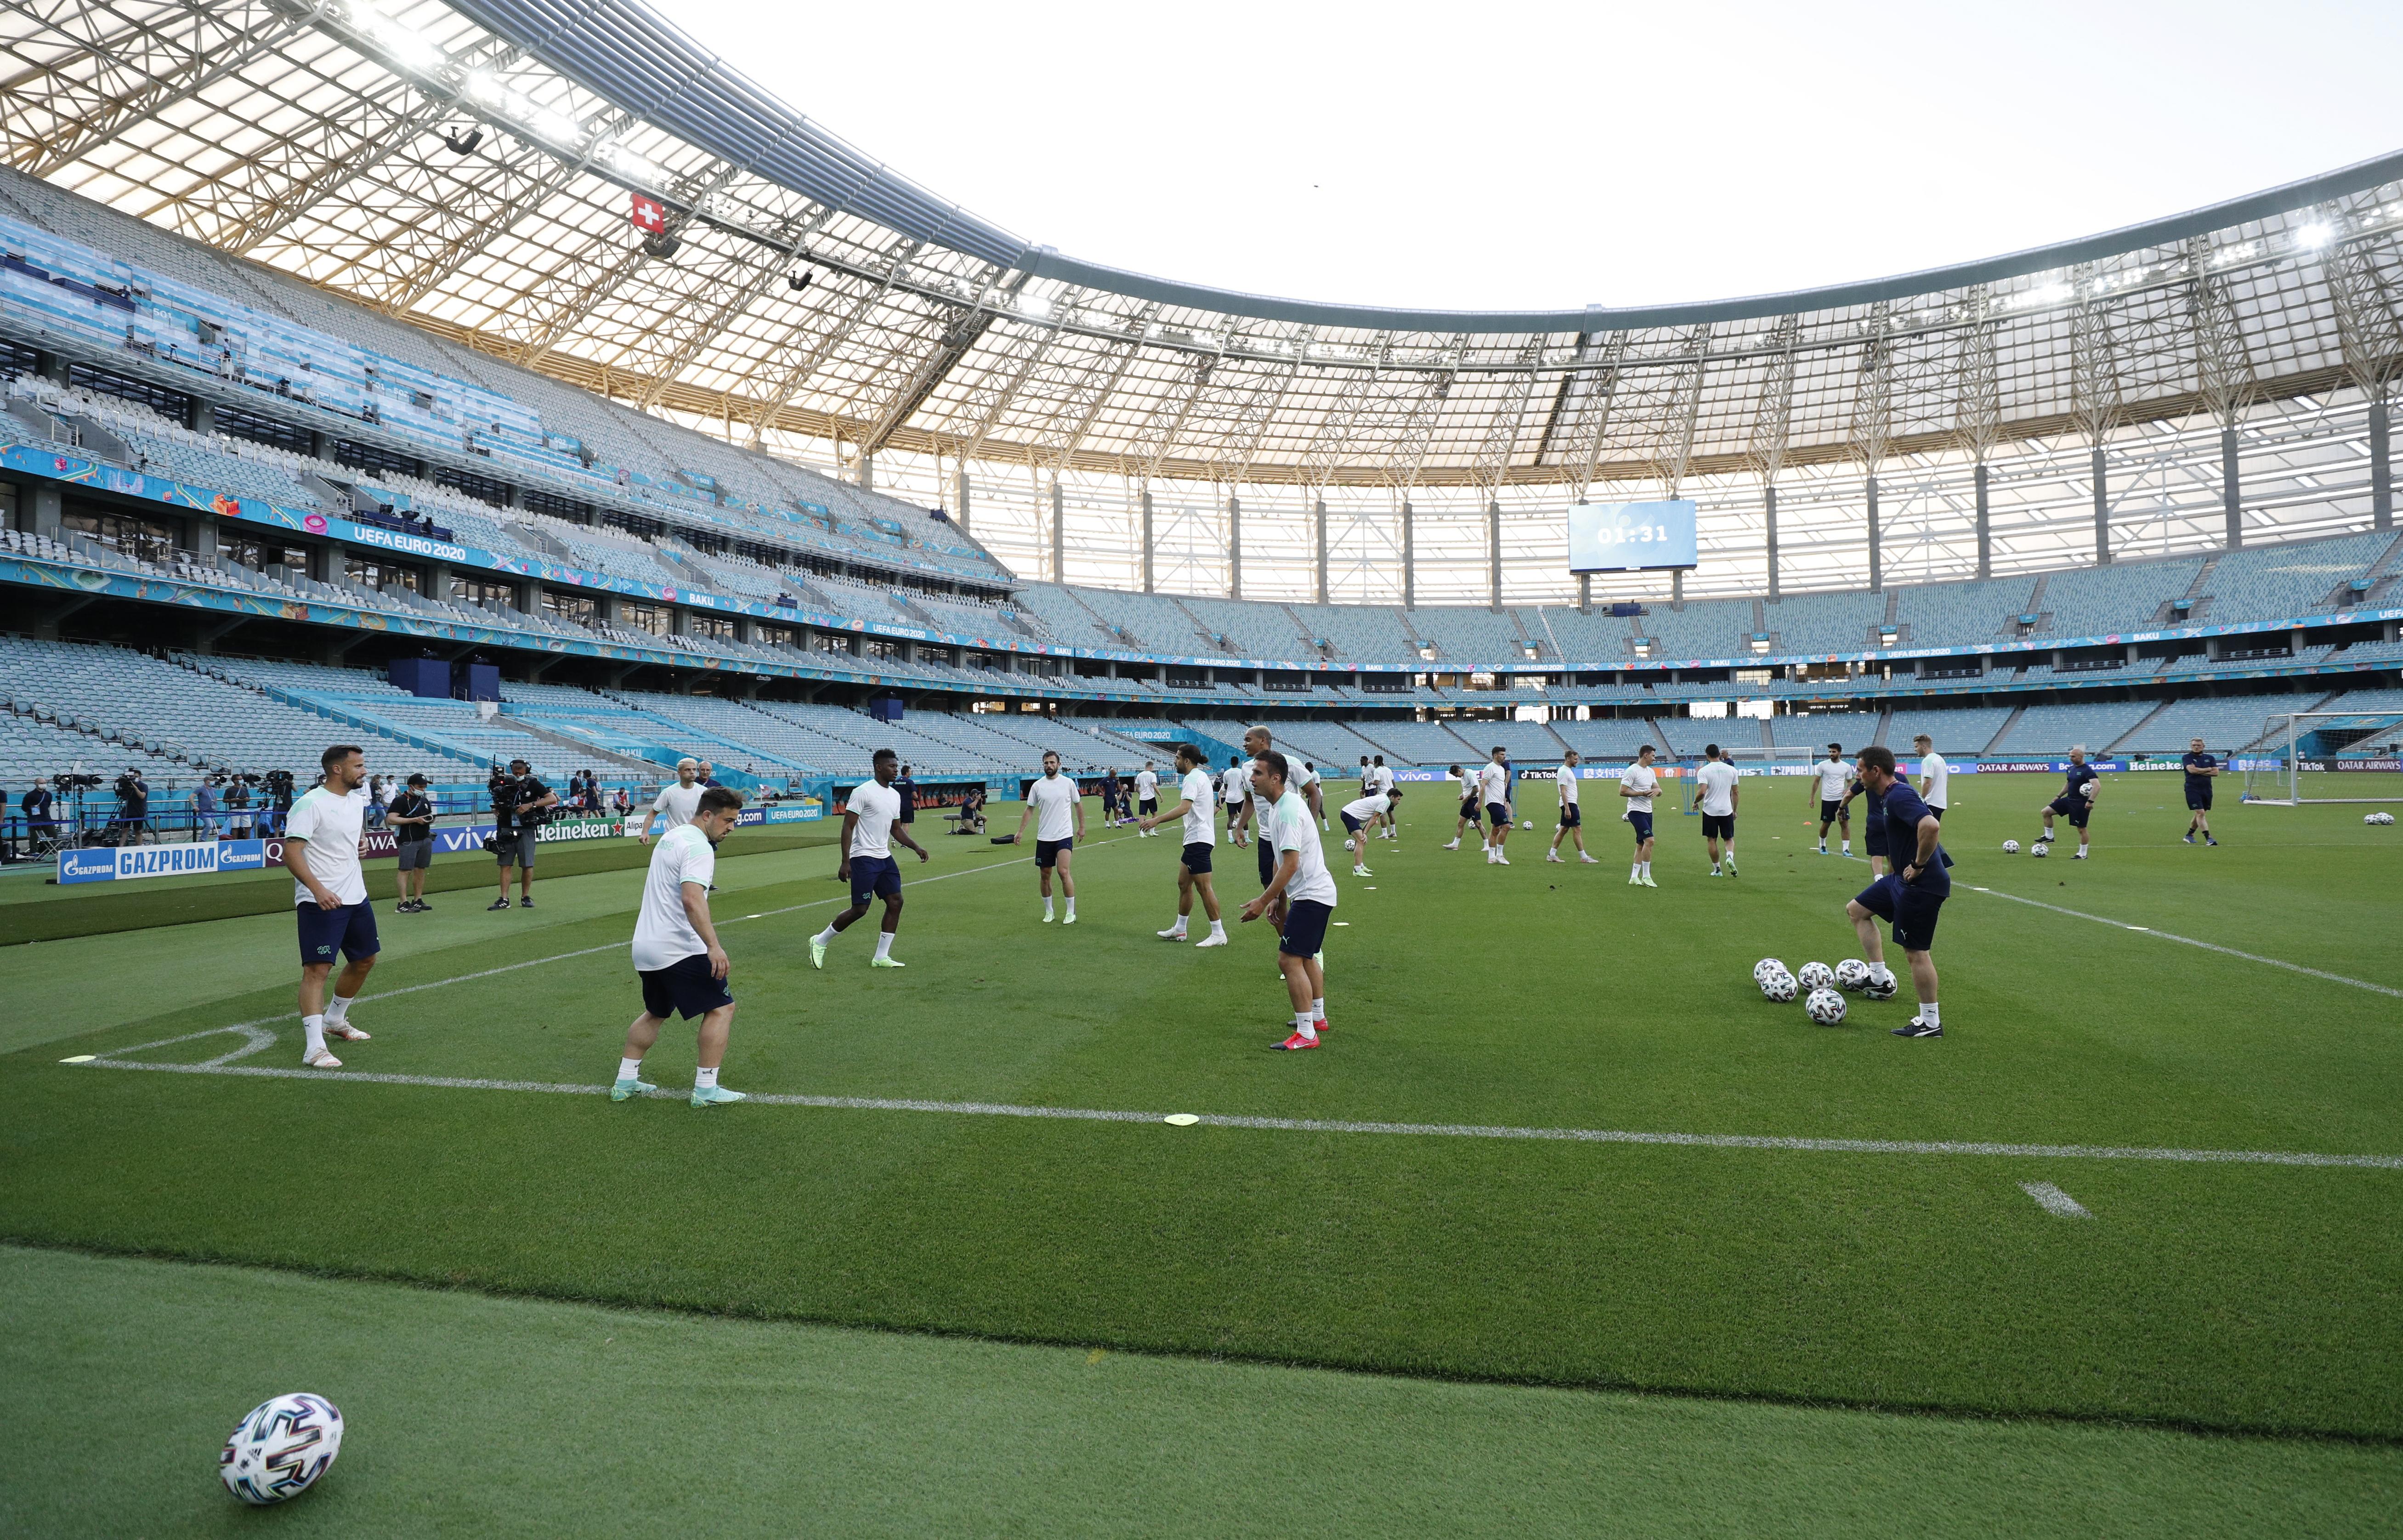 Soccer Football - Euro 2020 - Switzerland Training - Baku Olympic Stadium, Baku, Azerbaijan - June 19, 2021 General view during training REUTERS/Valentyn Ogirenko